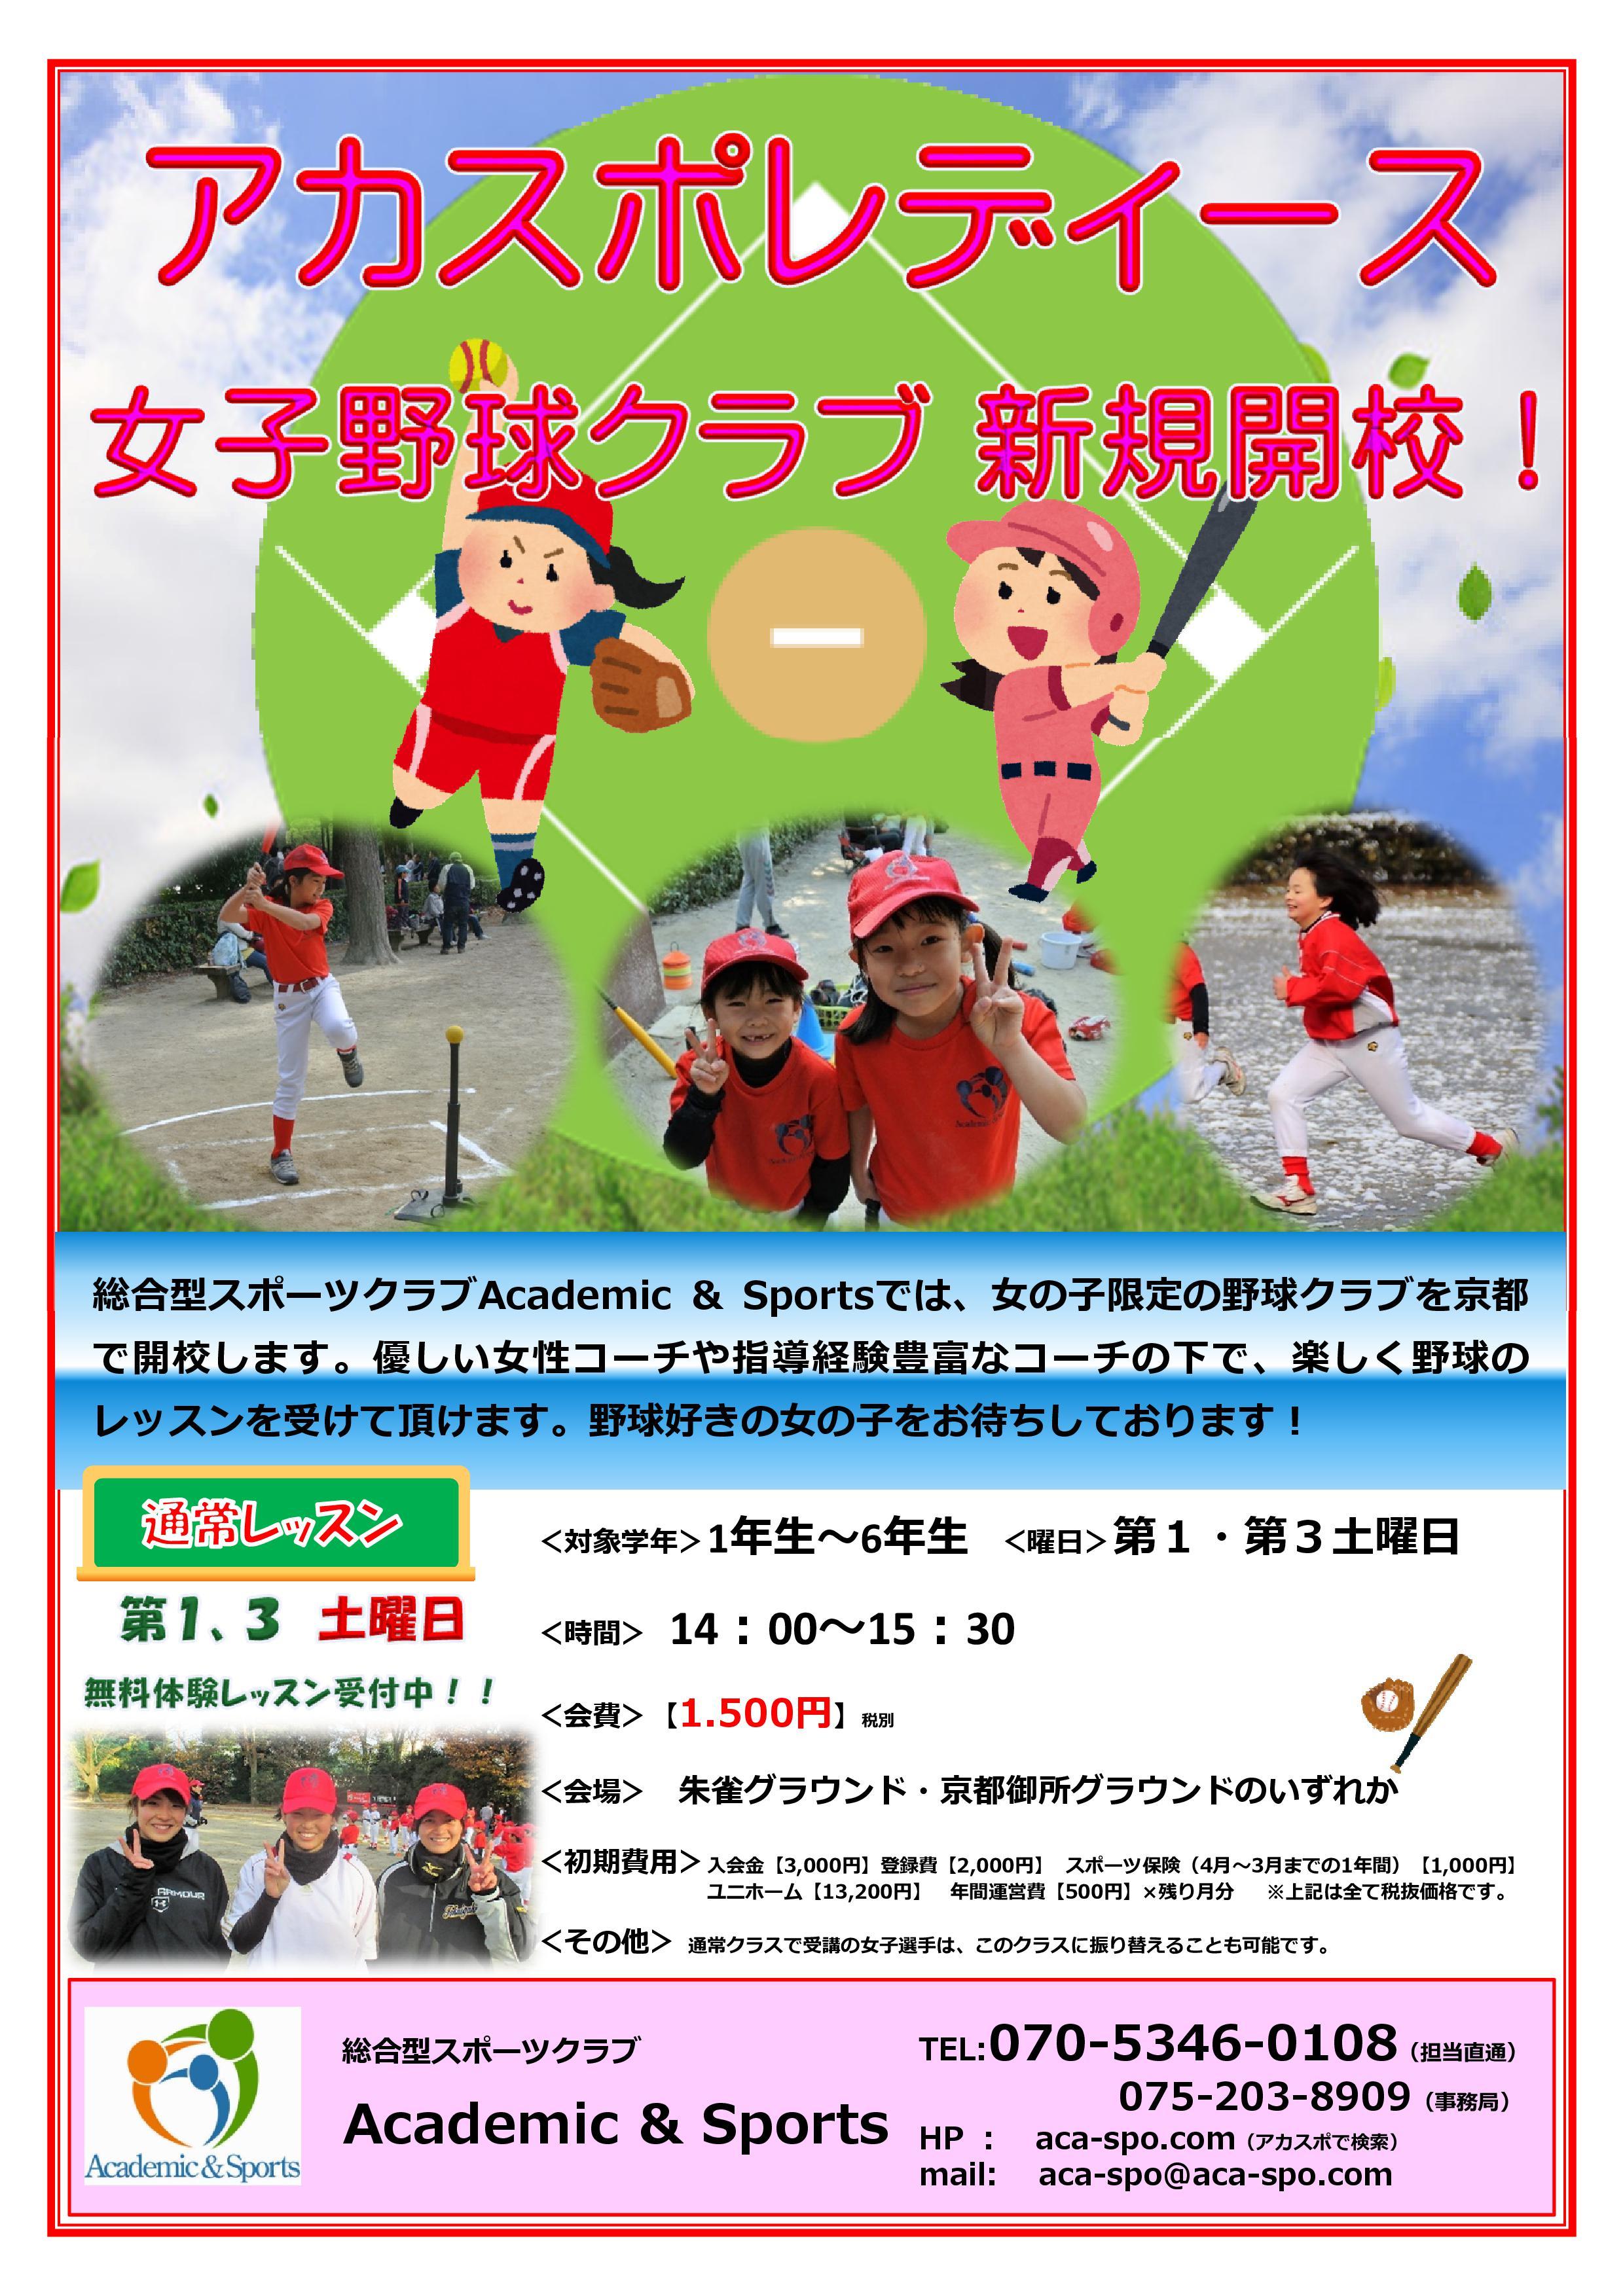 Microsoft PowerPoint - 女子野球 チラシ